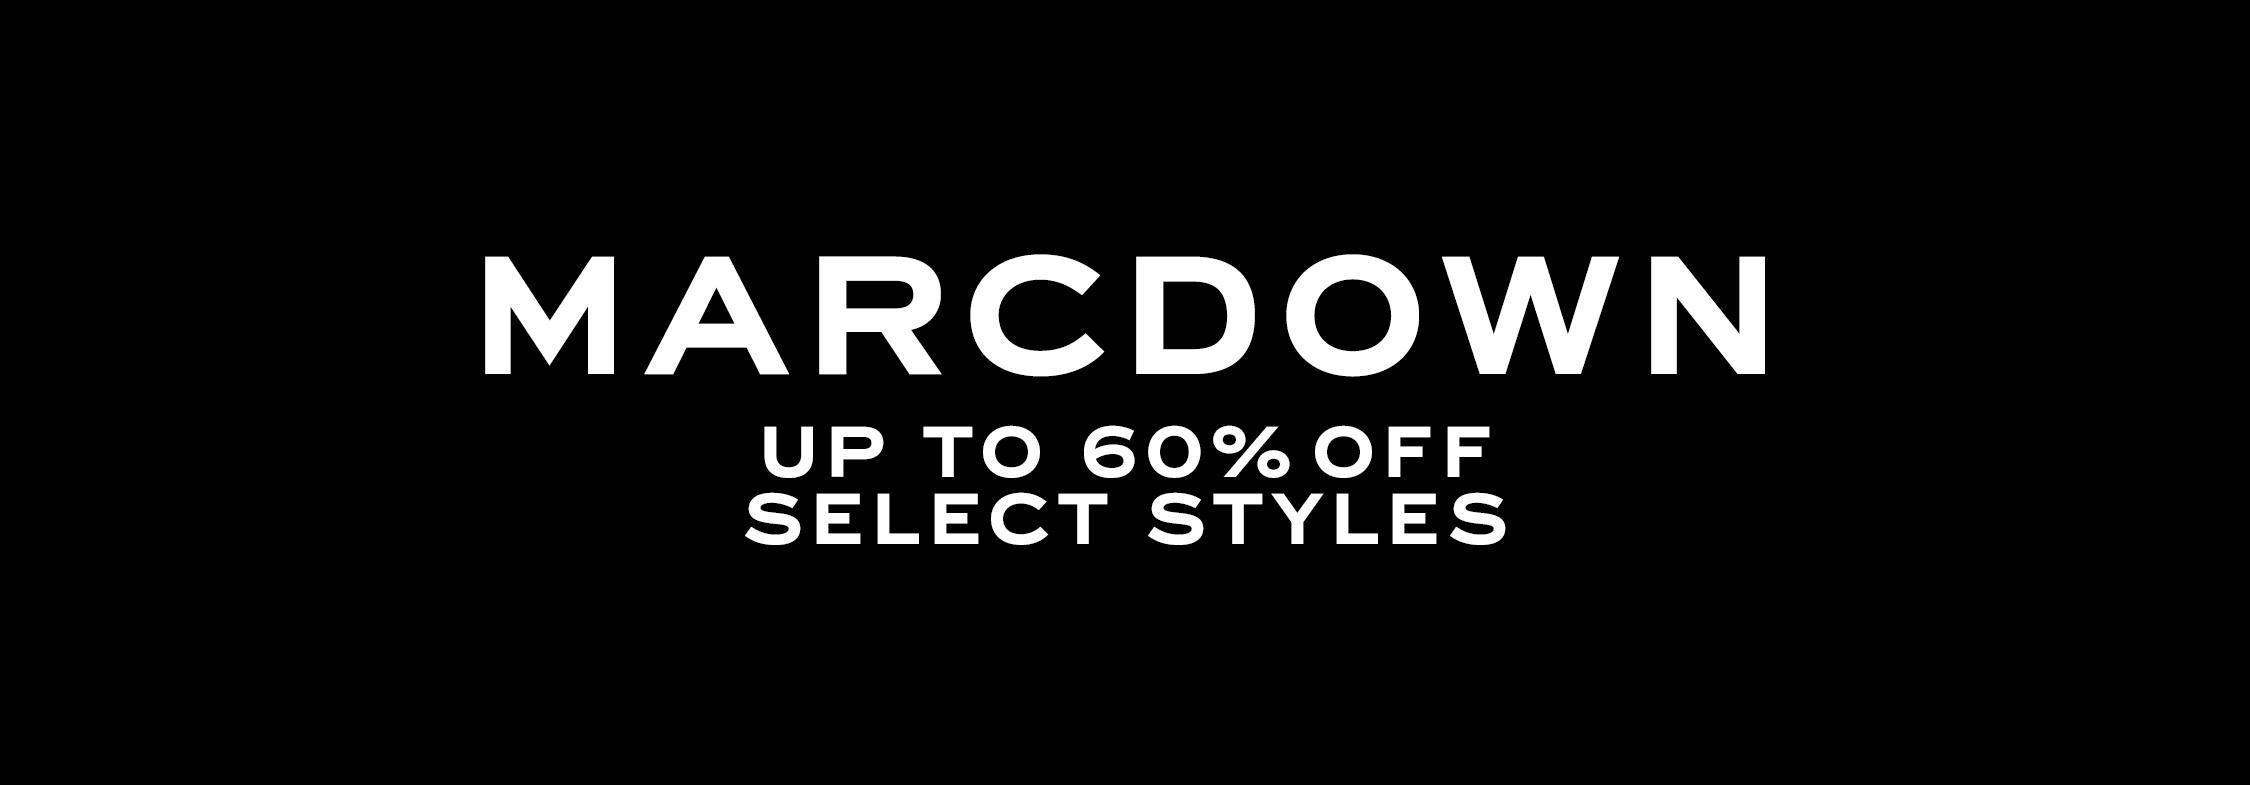 5886d8ebb3b3 MarcdownPLP Header Marc Jacobs - Marcdown